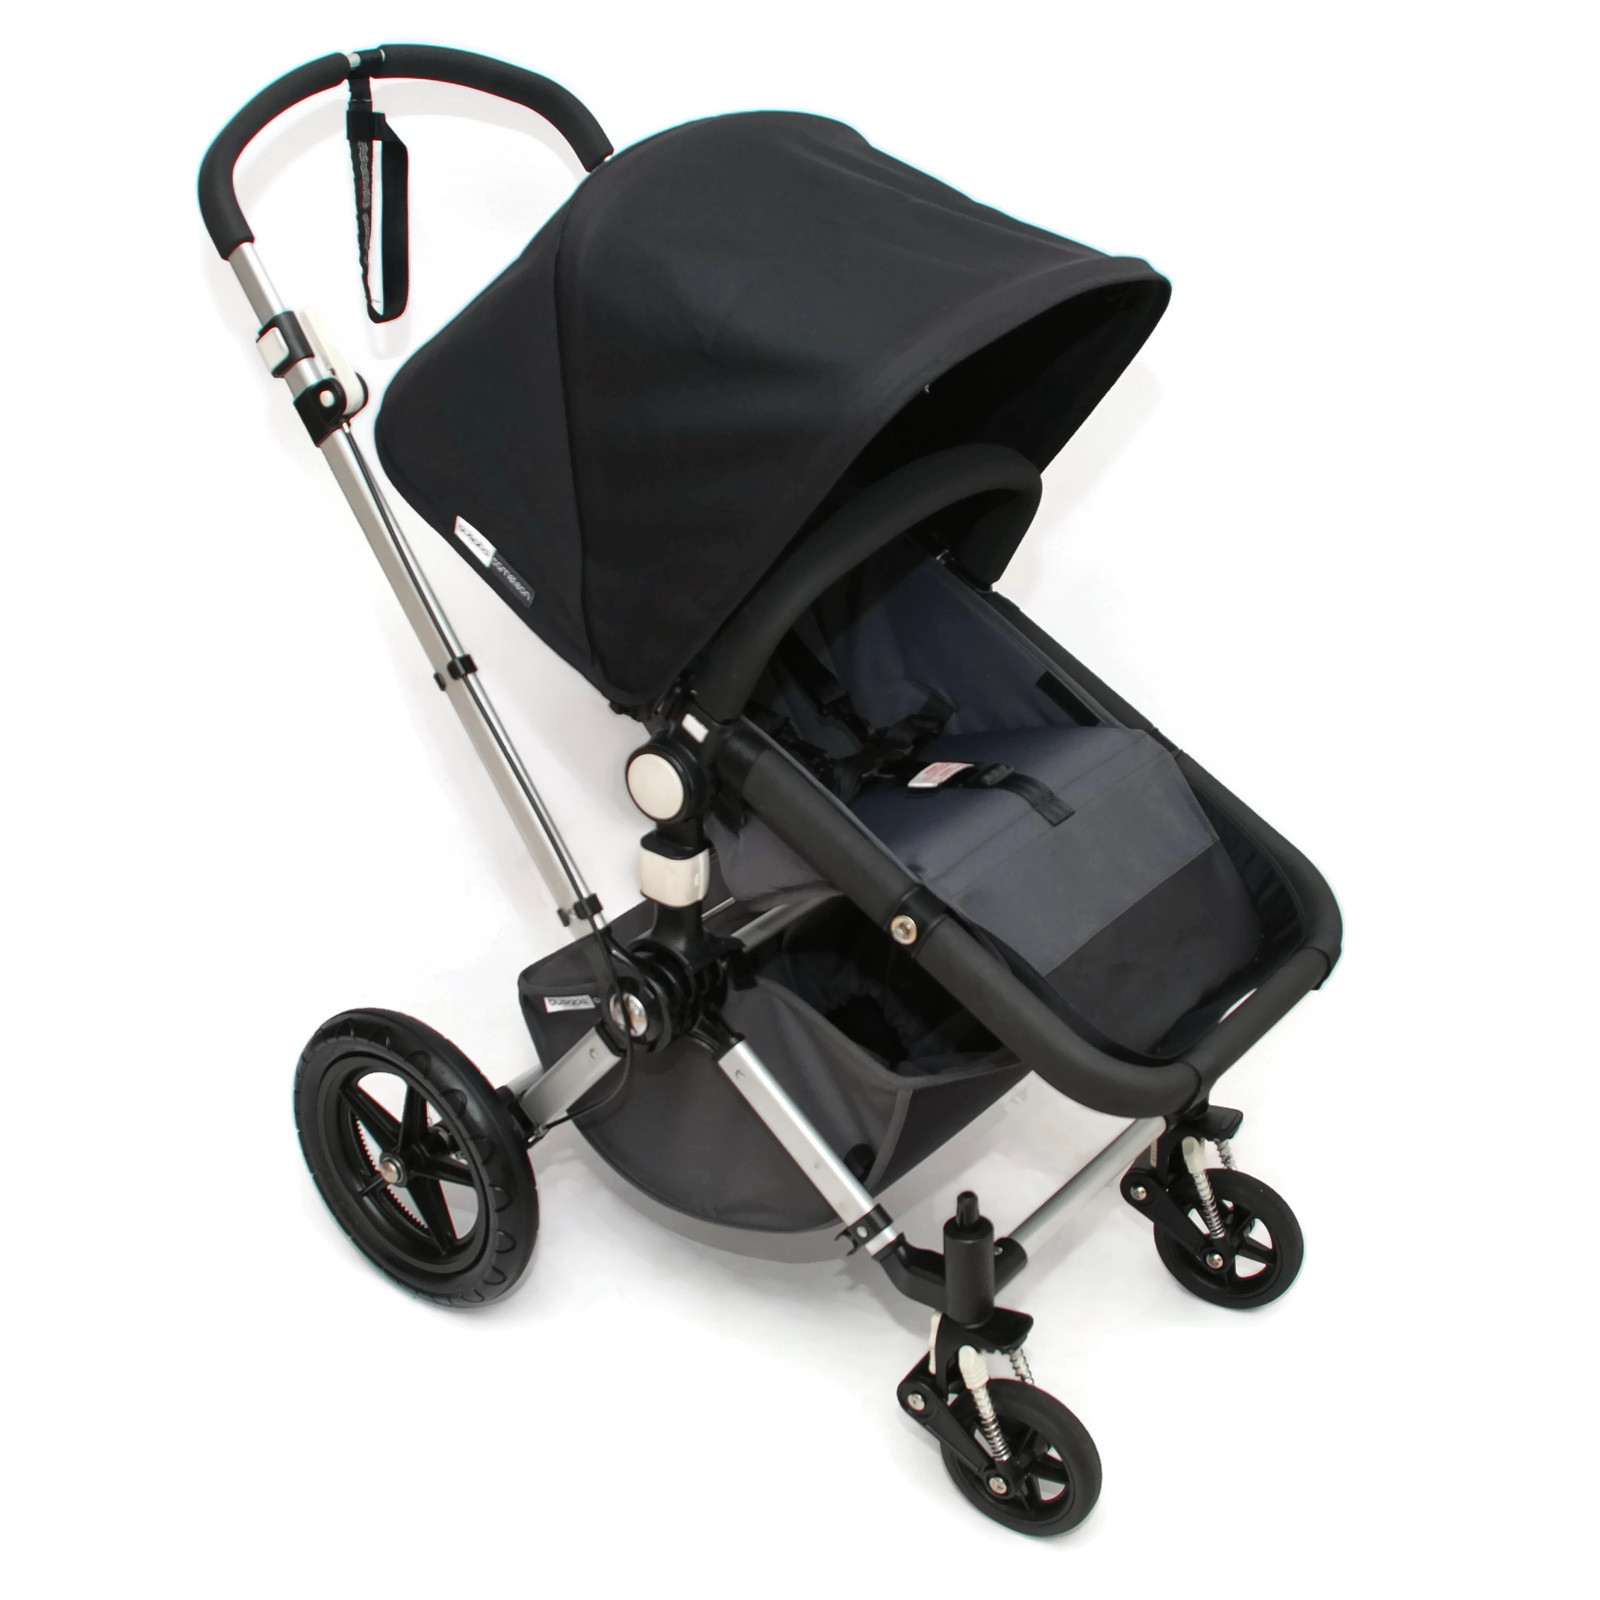 bugaboo cameleon 2 kinderwagen komplett schwarz black grau ebay. Black Bedroom Furniture Sets. Home Design Ideas